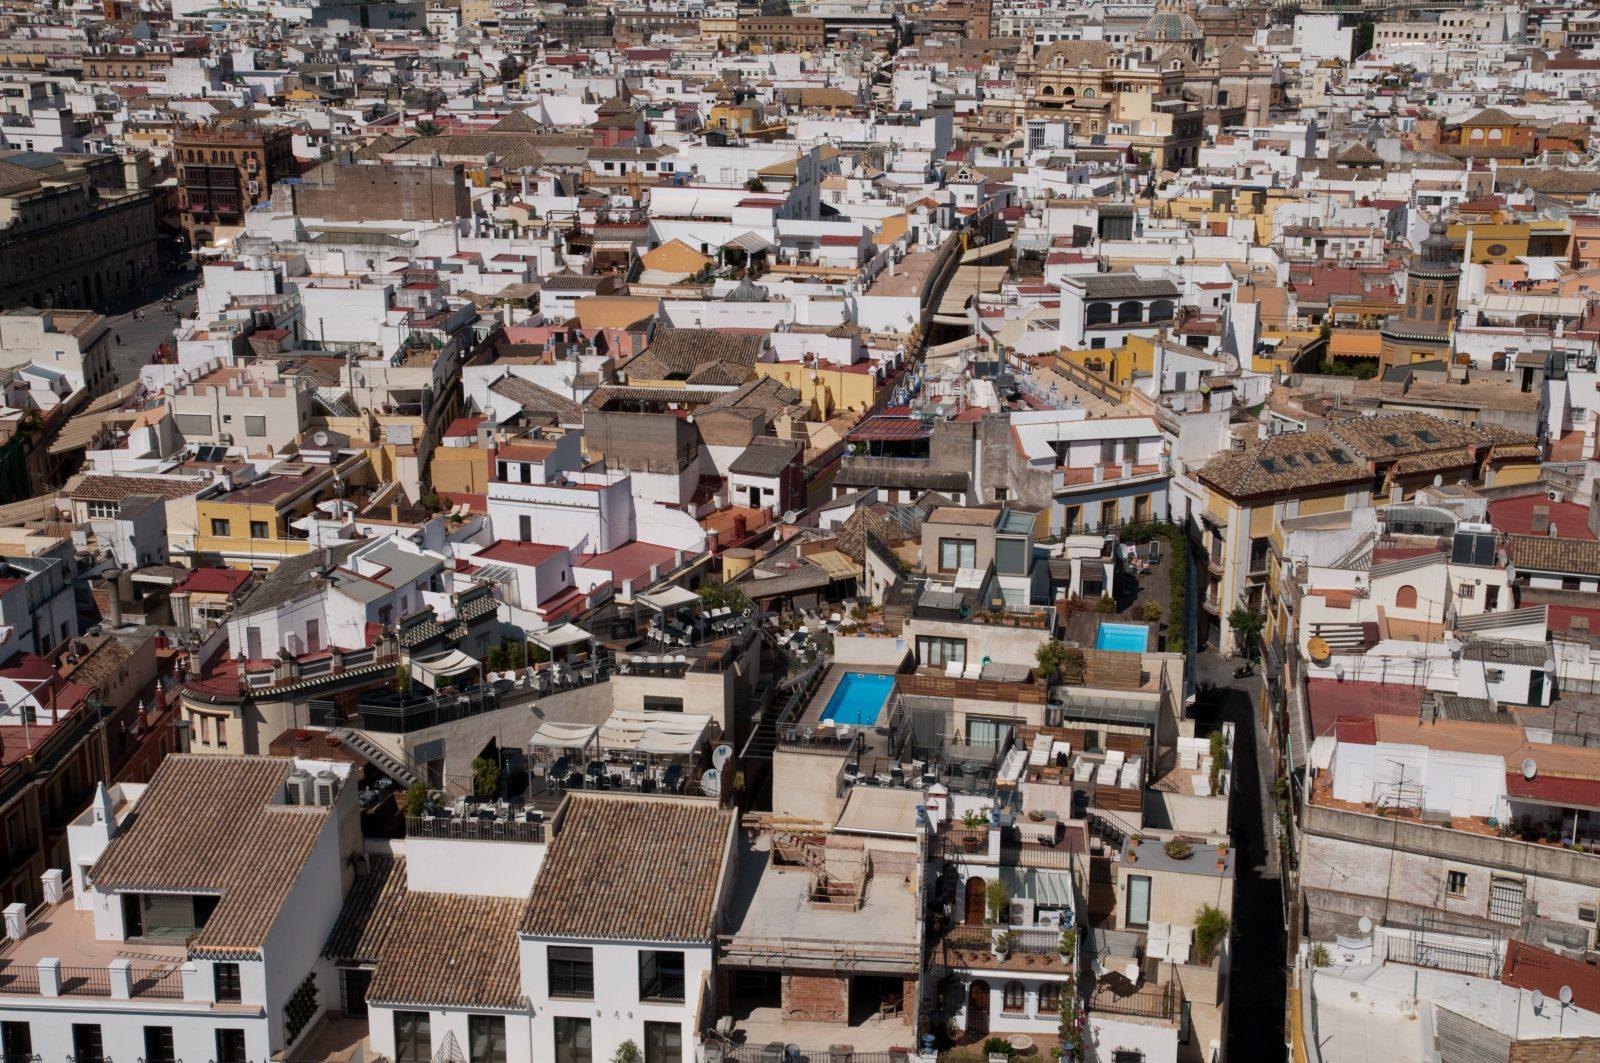 City Rooftops Pattern Photo Sevilla Spain